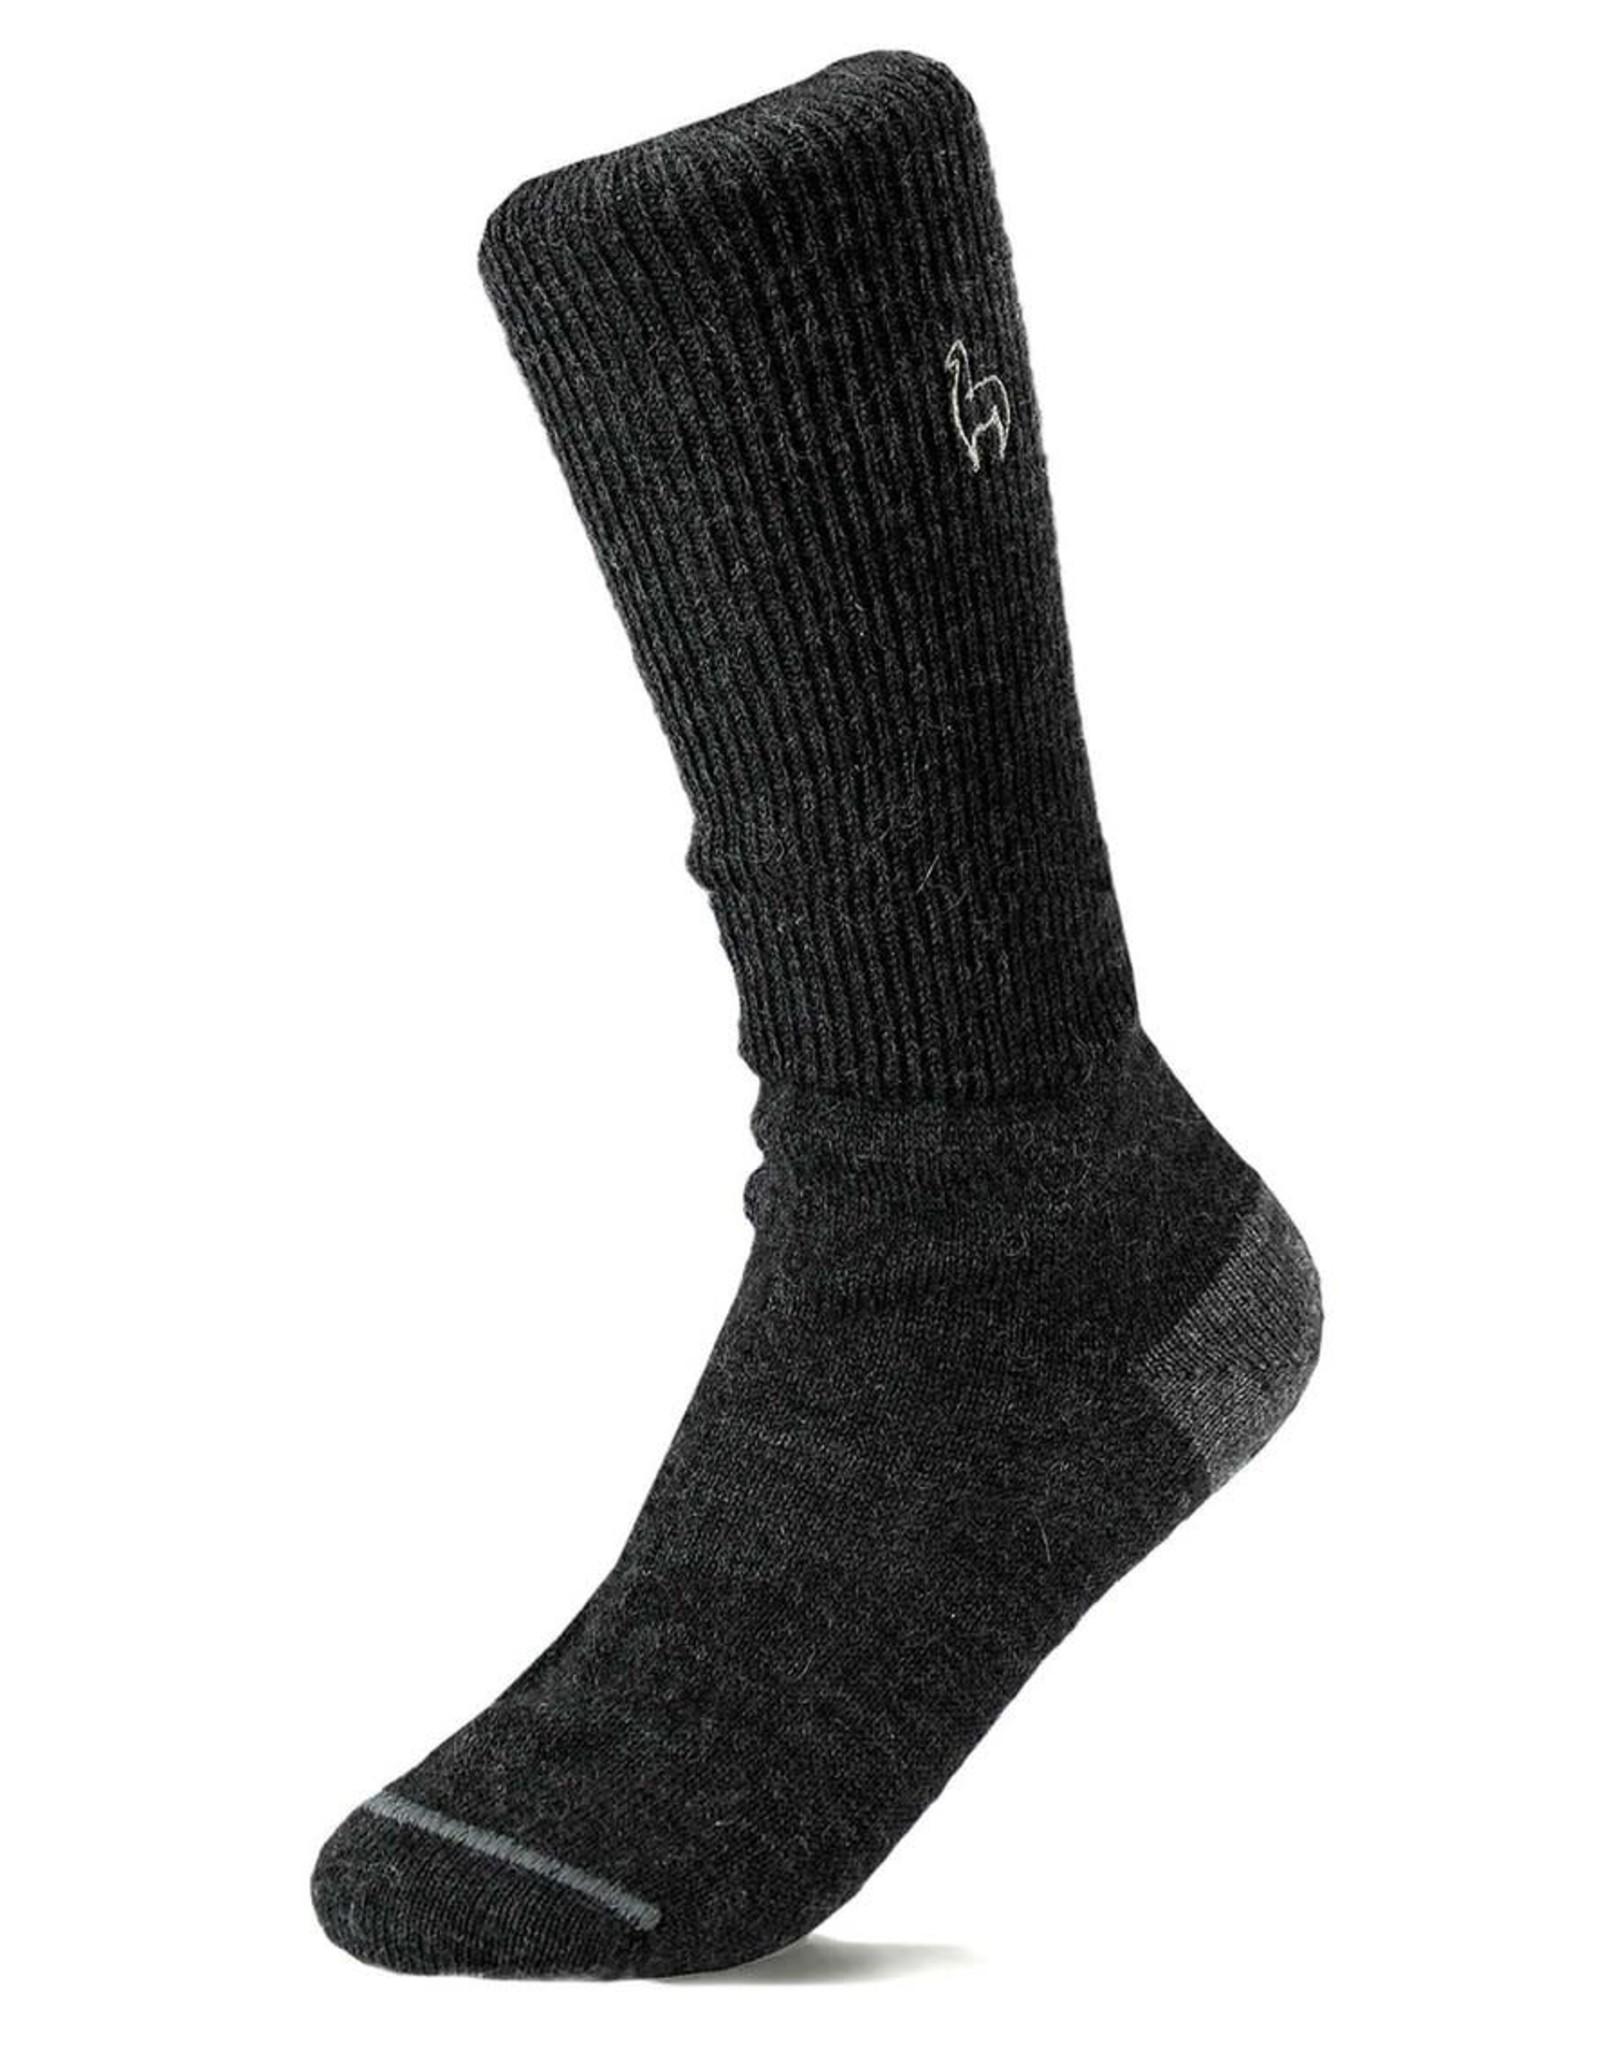 Shupaca Shupaca Business Socks Medium Black